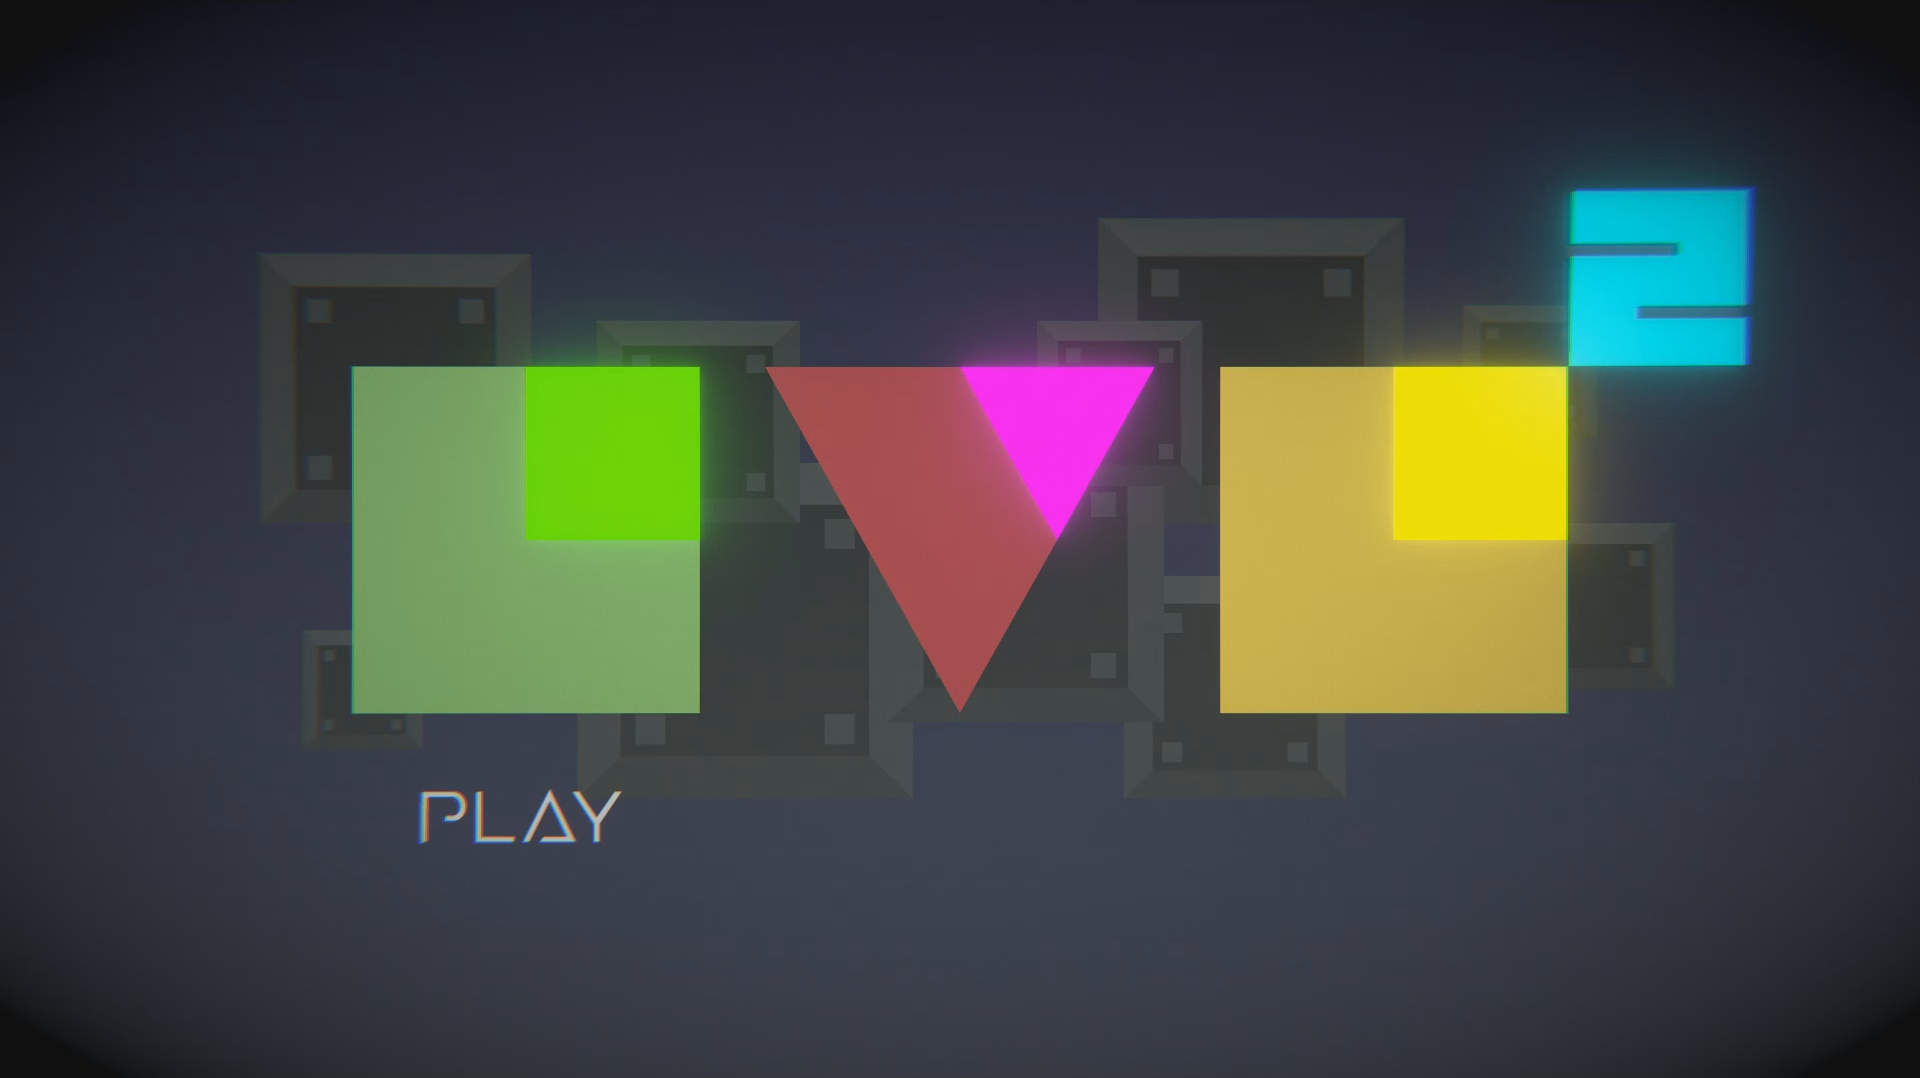 LVL² - Level Squared